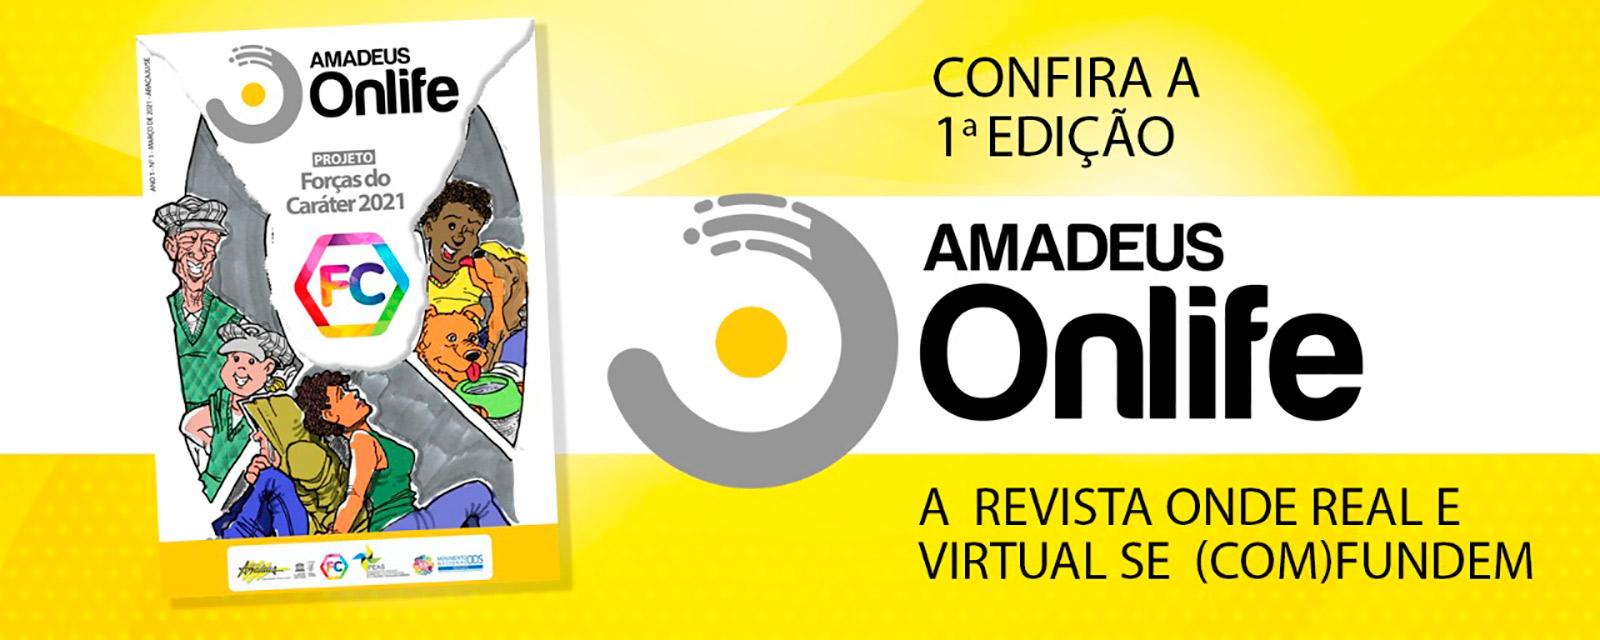 Amadeus Onlife